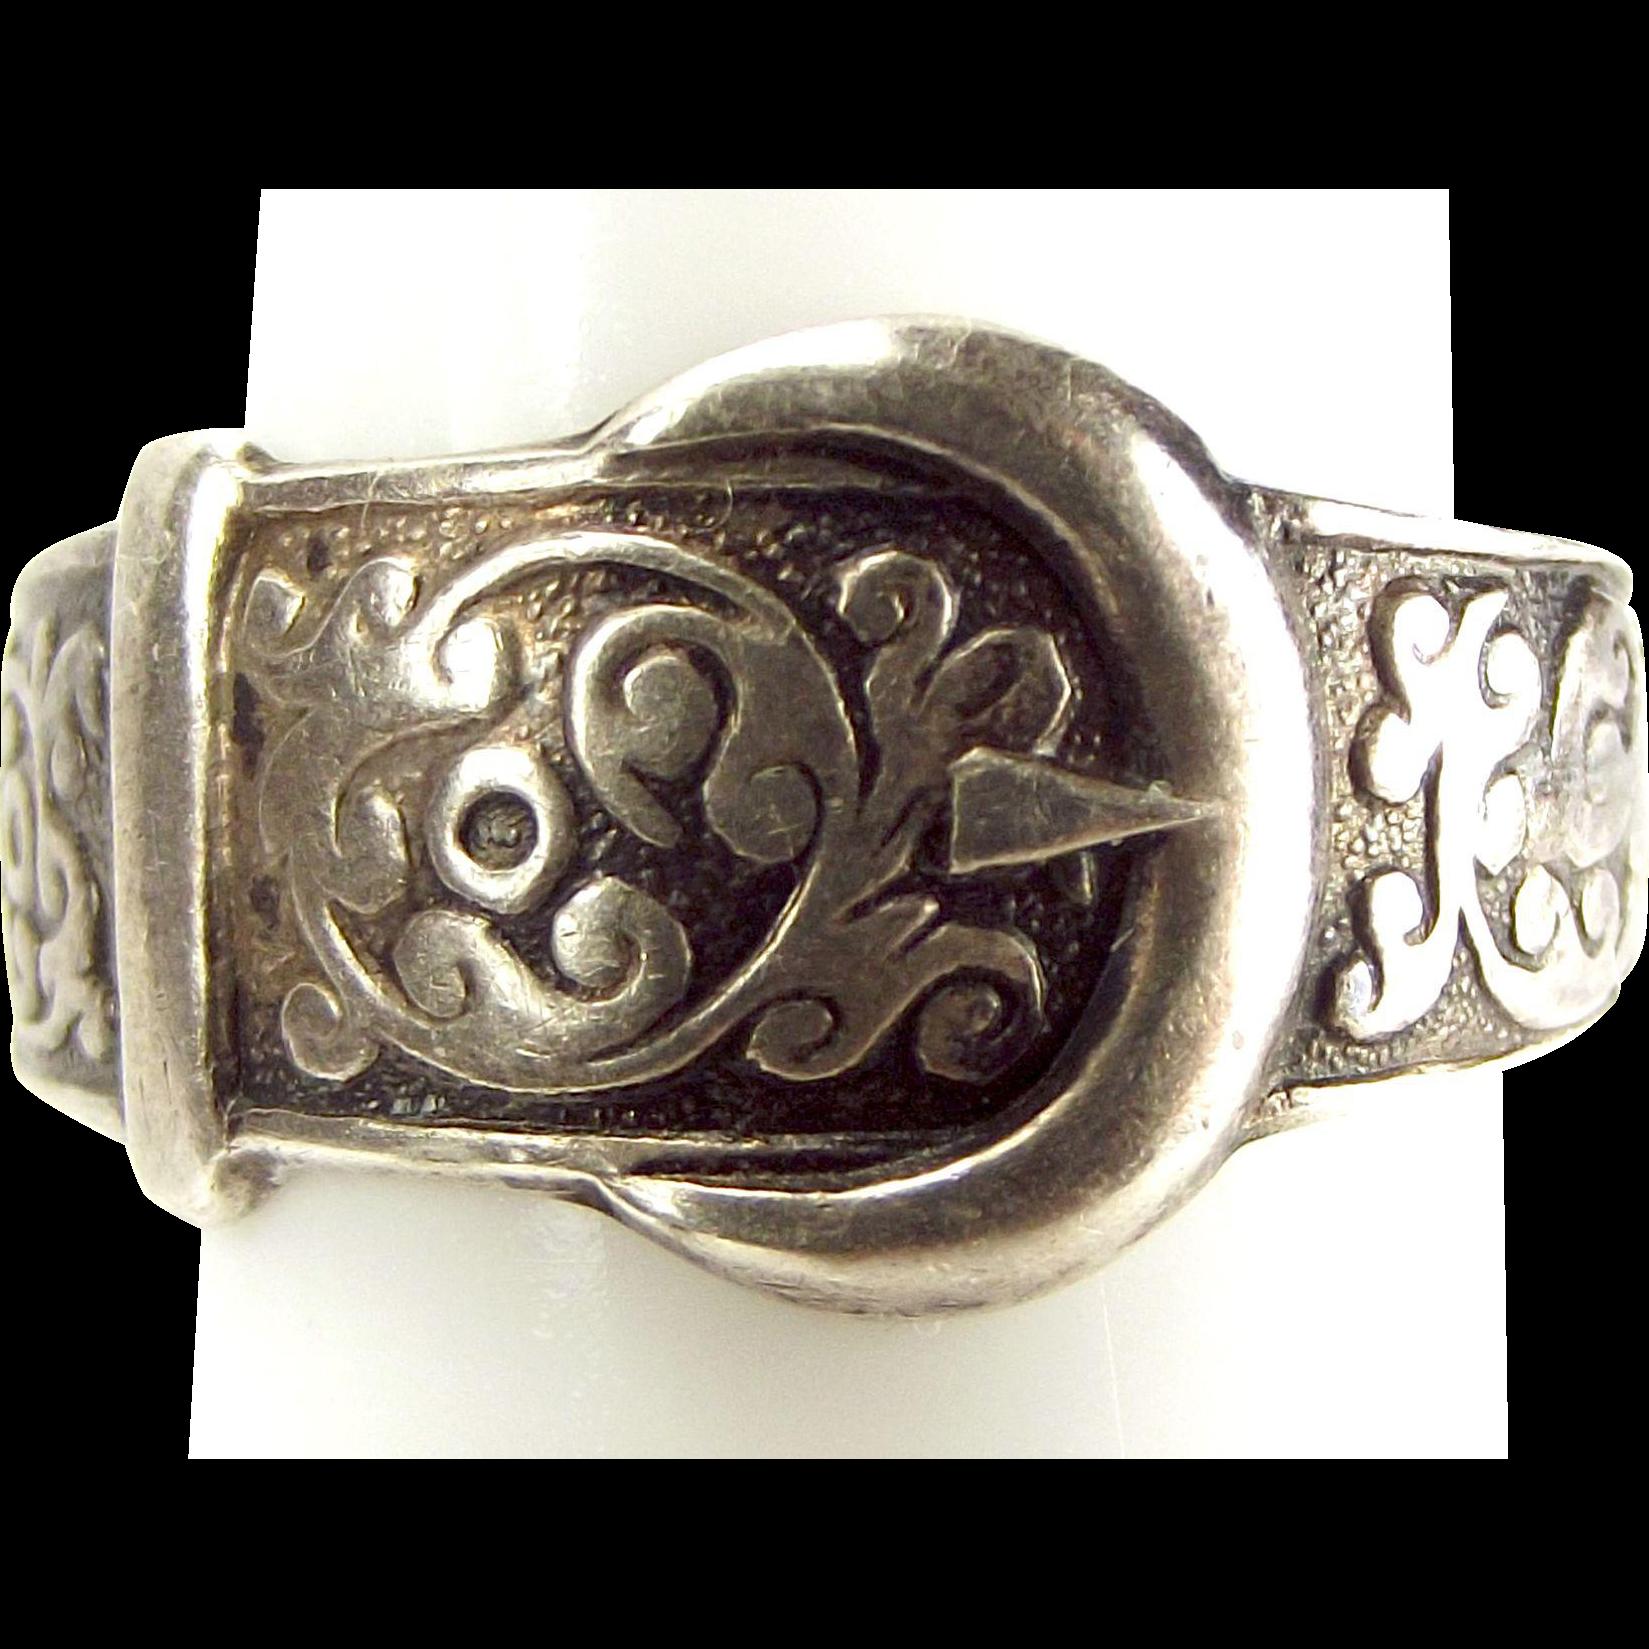 Vintage STERLING Silver Ornate BUCKLE Ring 1977